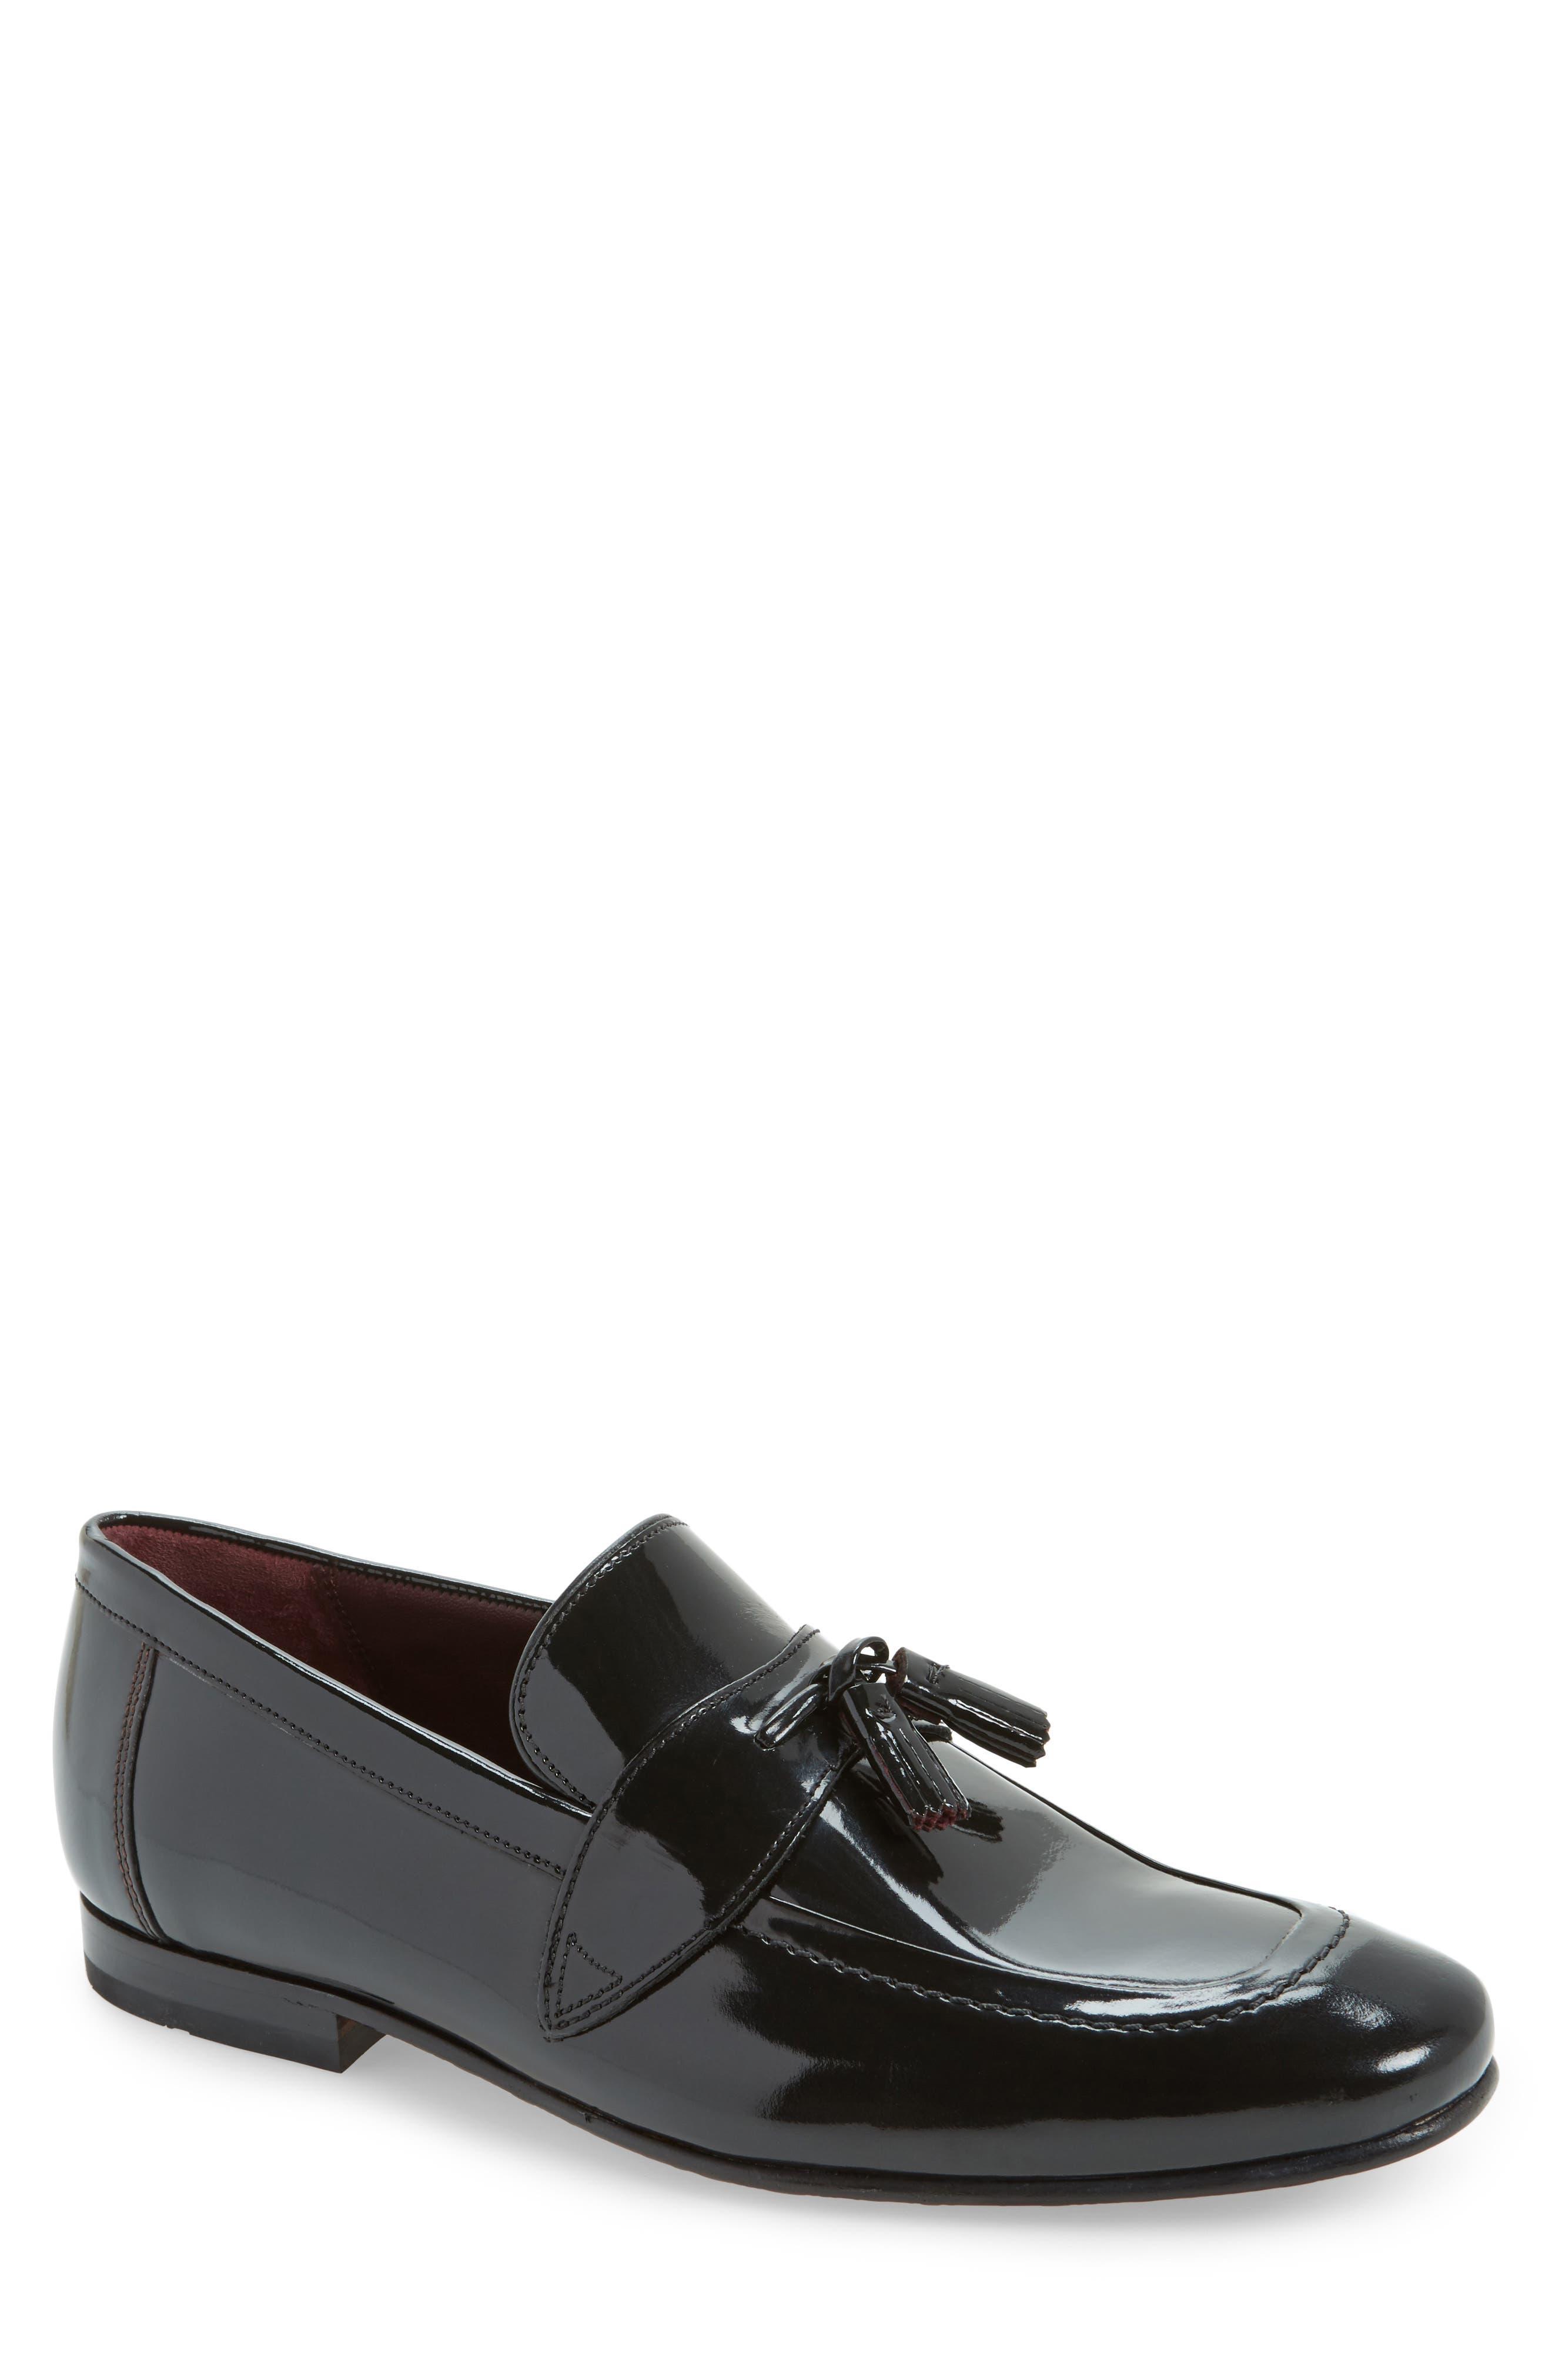 Grafit Tassel Loafer,                             Main thumbnail 1, color,                             Black Patent Leather